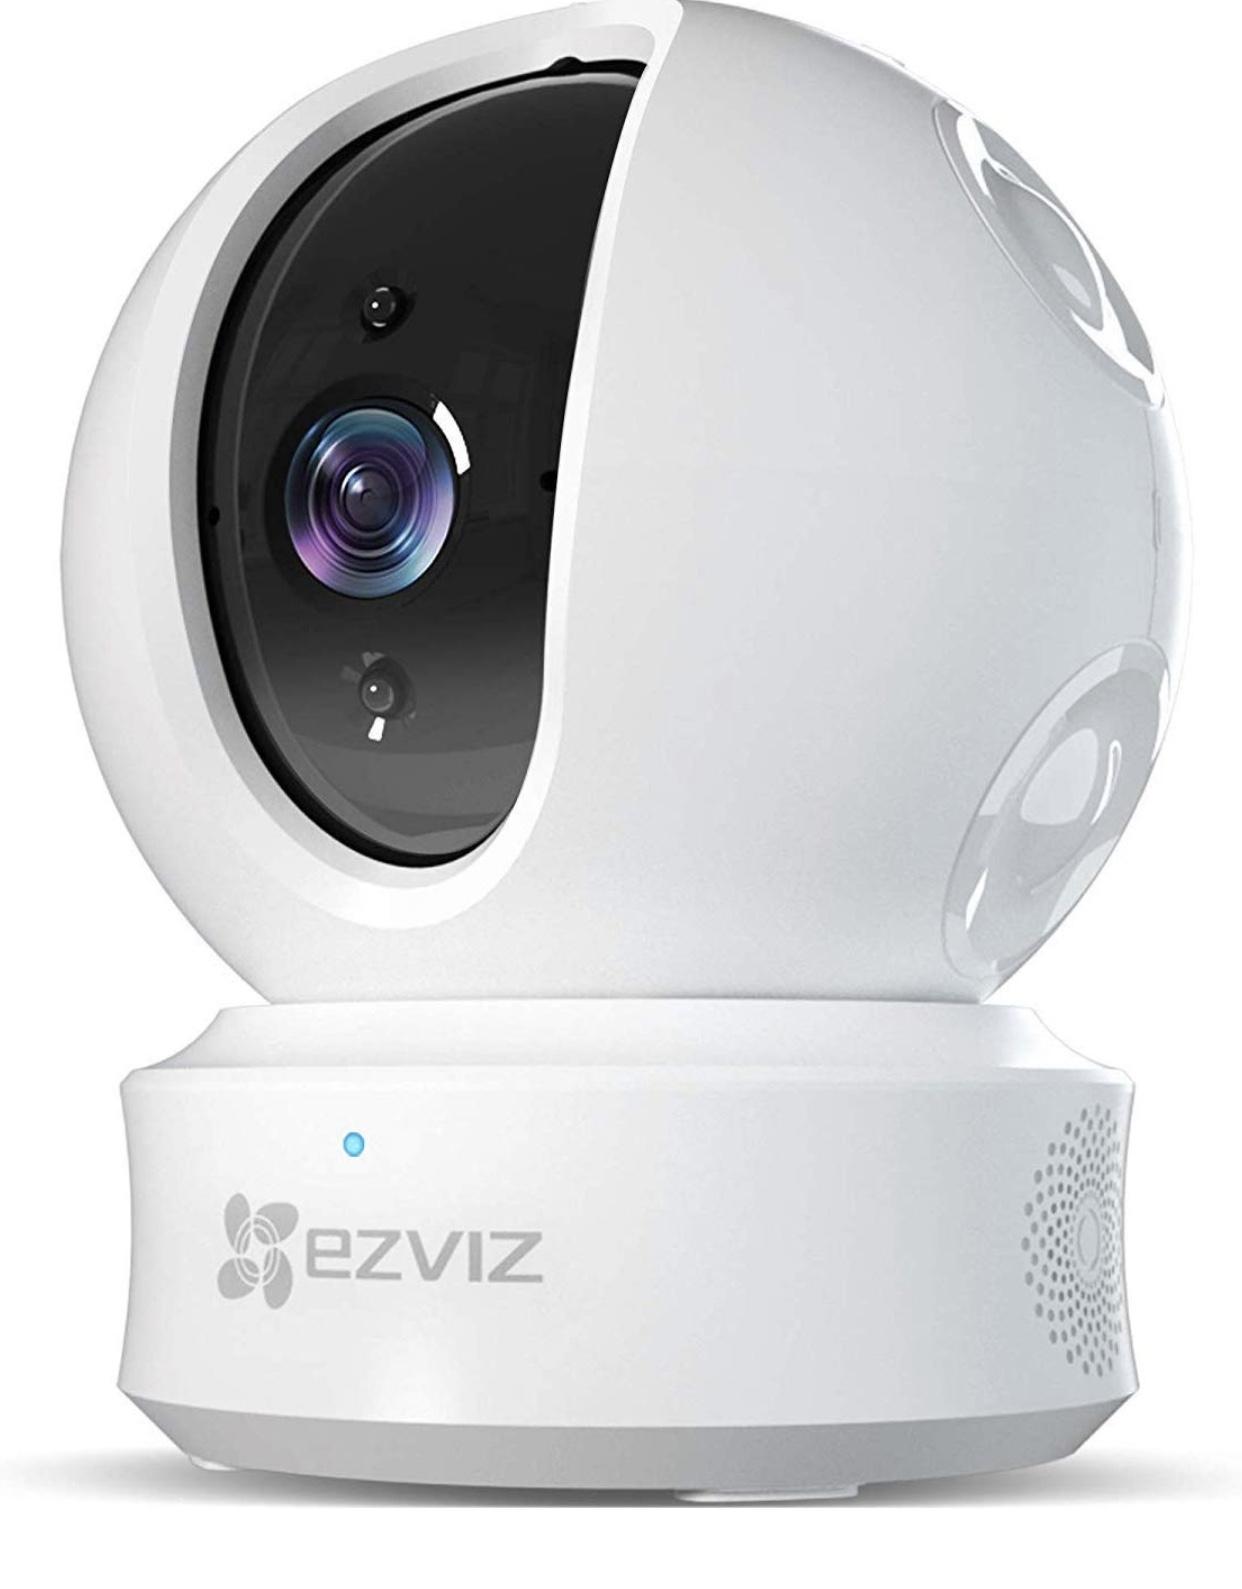 EZVIZ Pan/Tilt/Zoom 1080p IP Dome Camera with Alexa $34.99